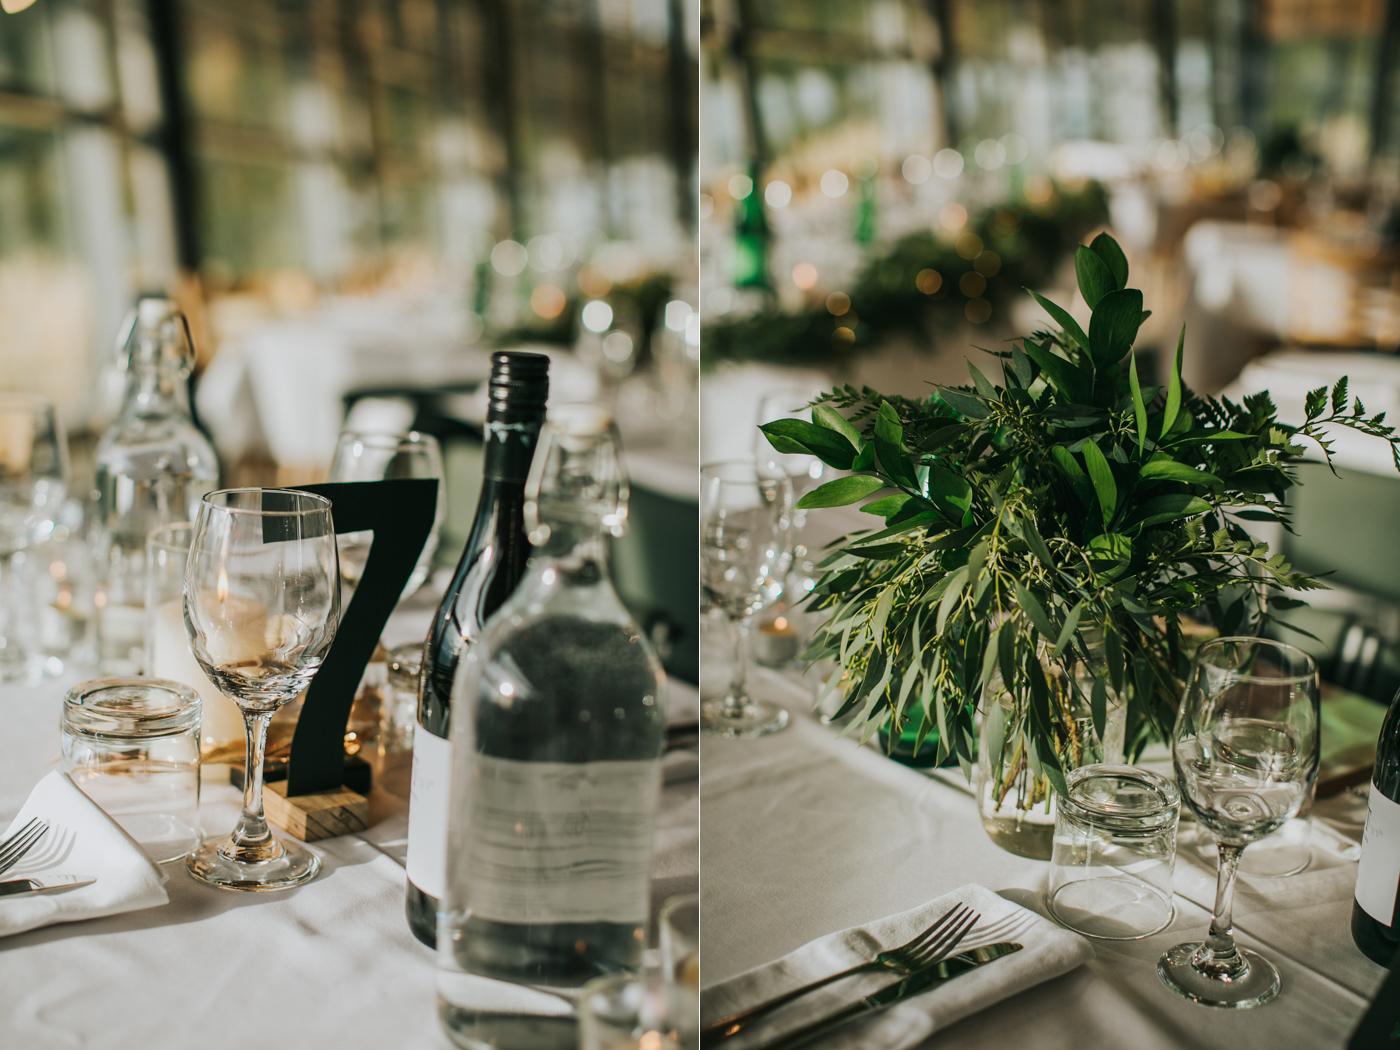 Ariana & Tim - Dunedin, New Zealand Wedding - Destination Wedding - Samantha Heather Photography-212.jpg